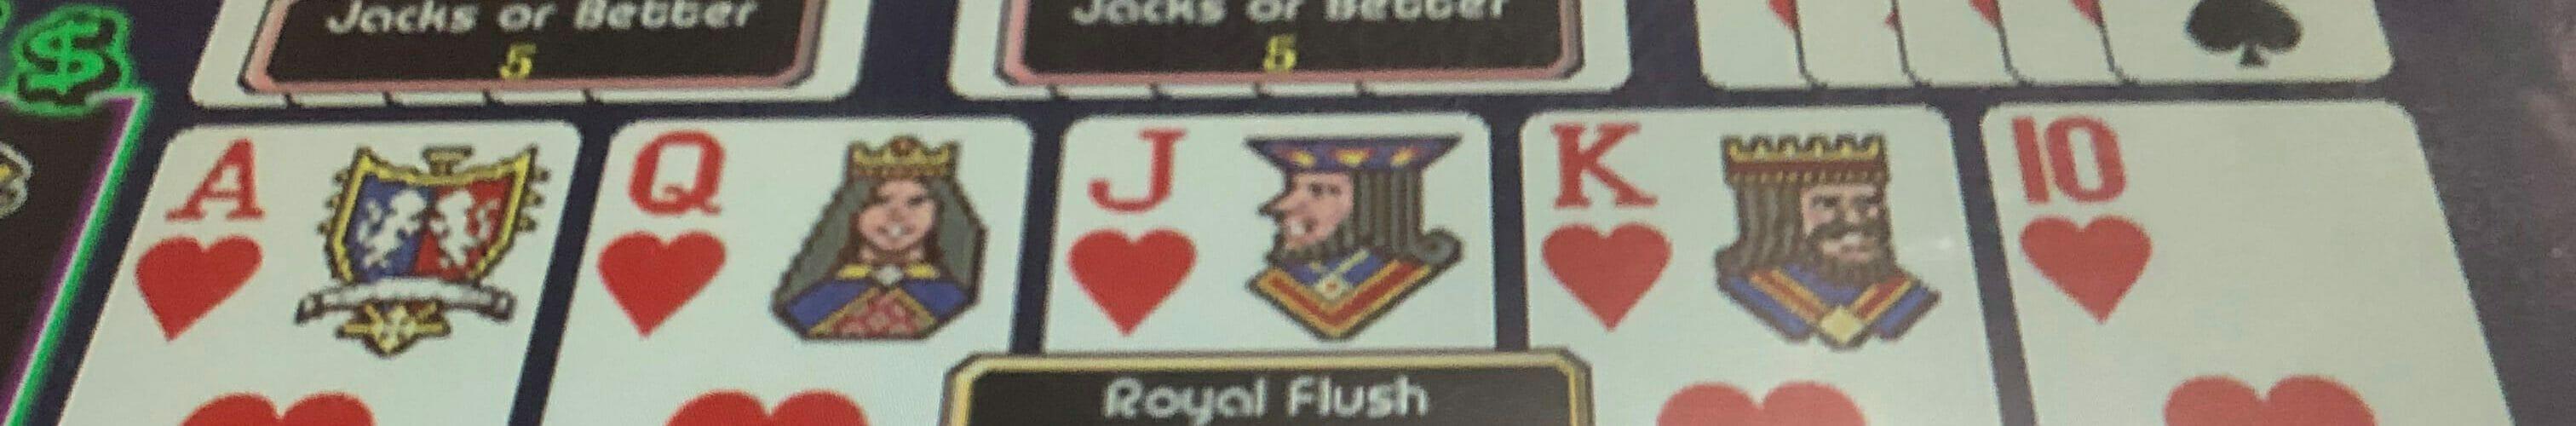 Nickels royal flush on free play